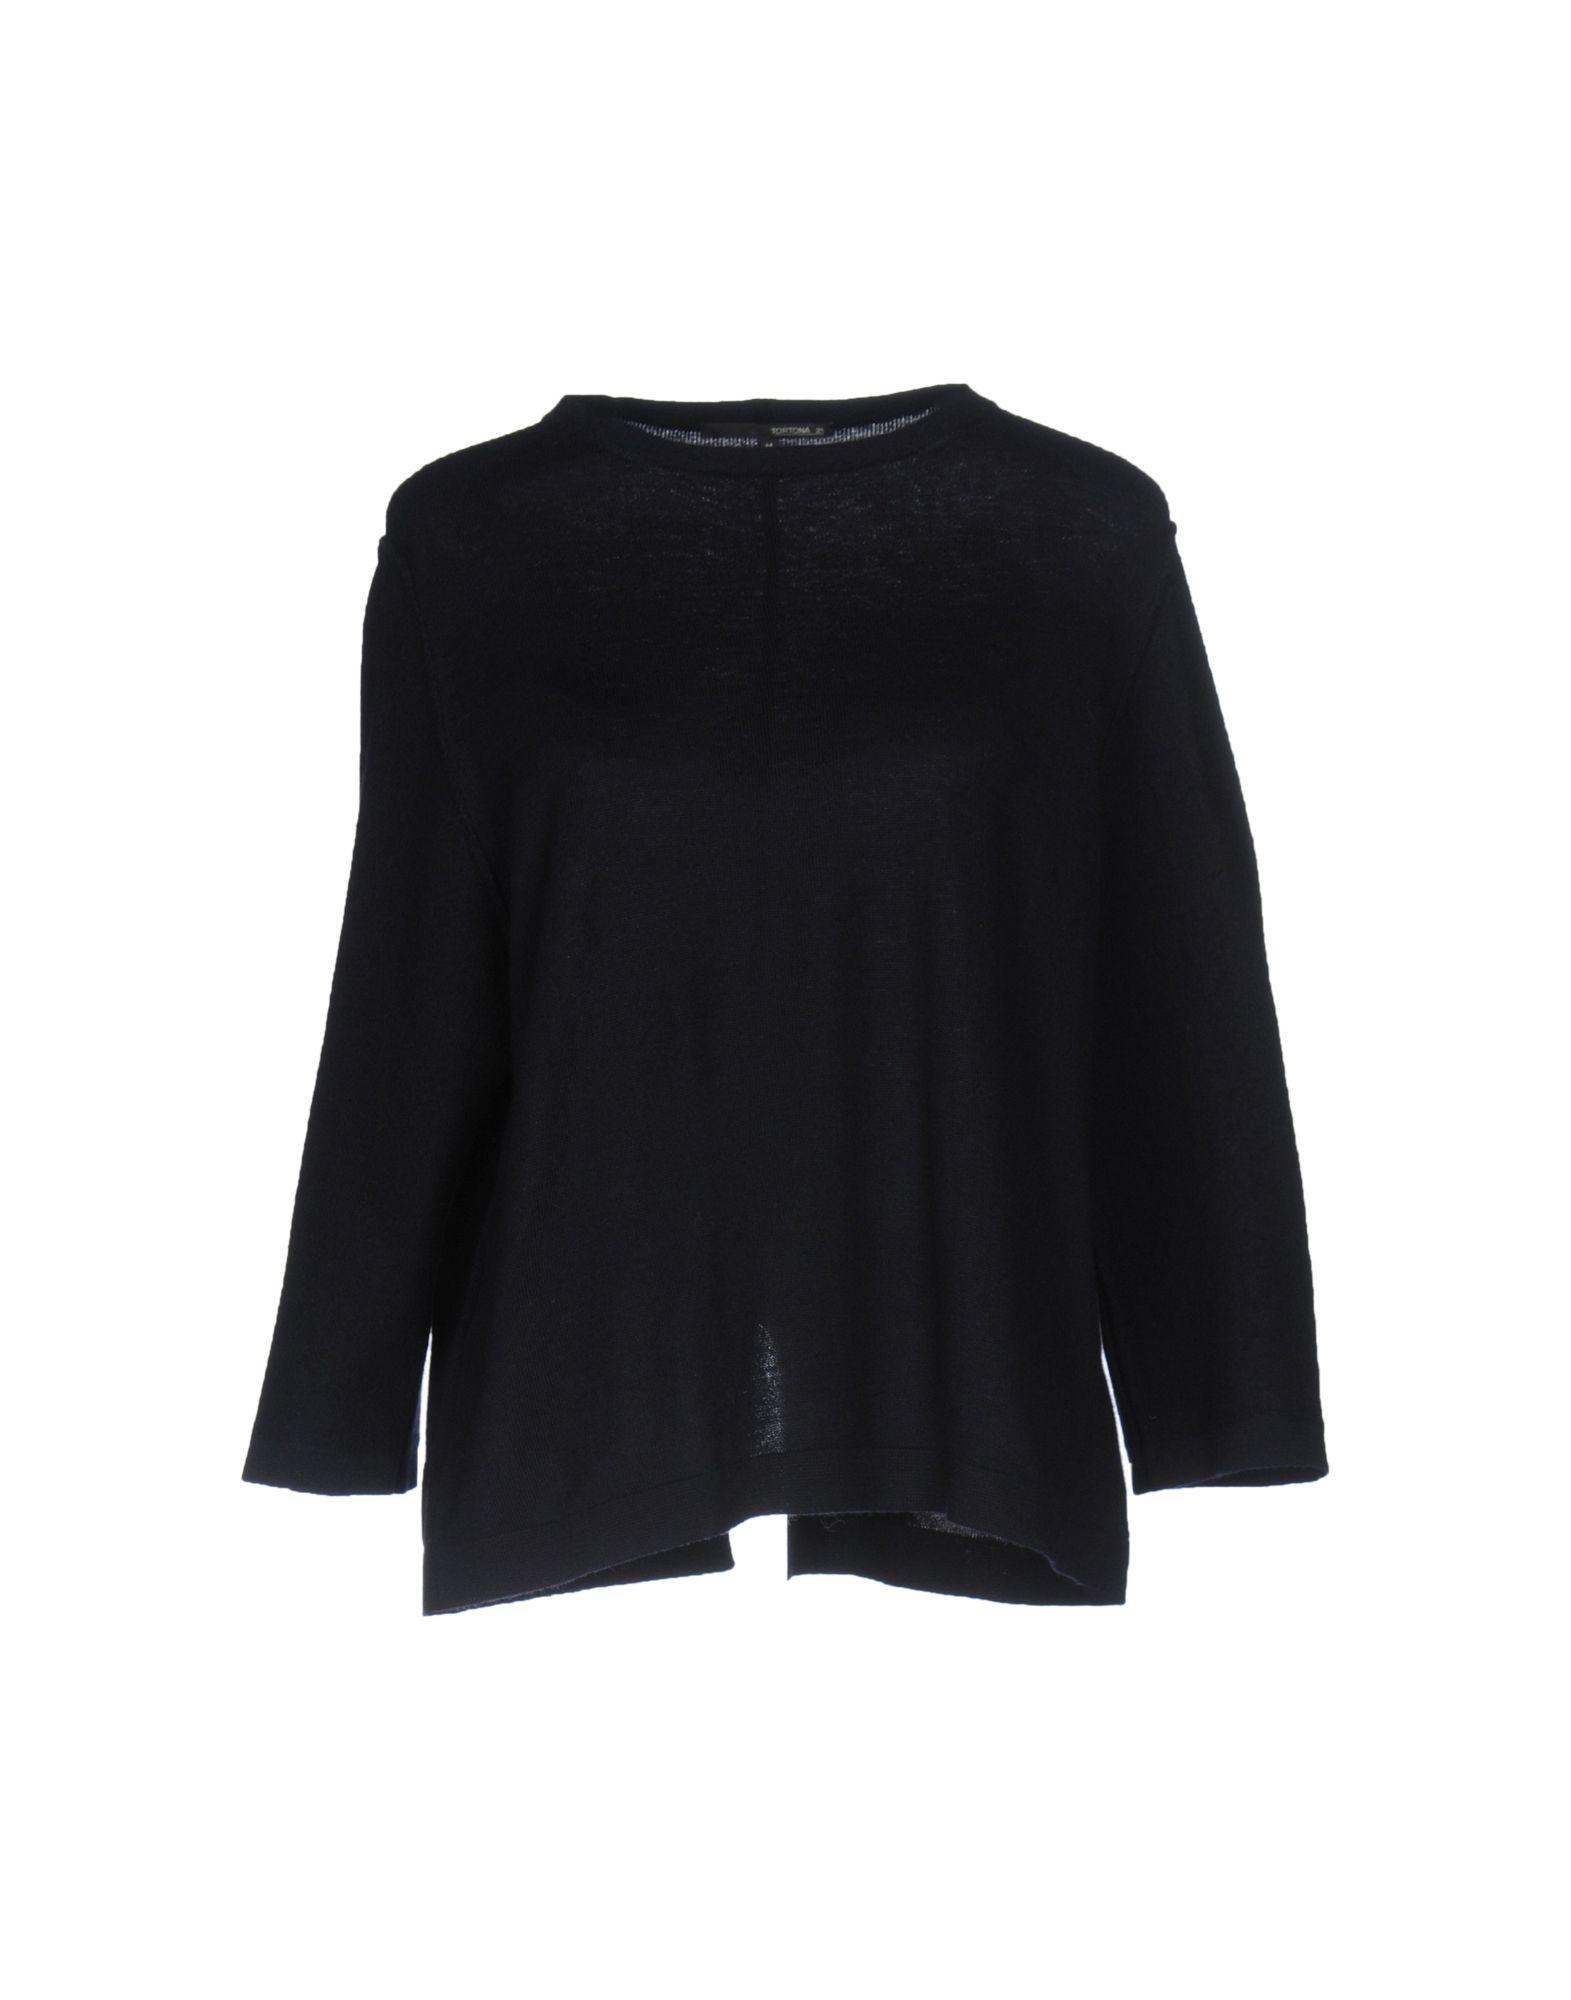 TORTONA 21 Damen Pullover Farbe Dunkelblau Größe 5 - broschei